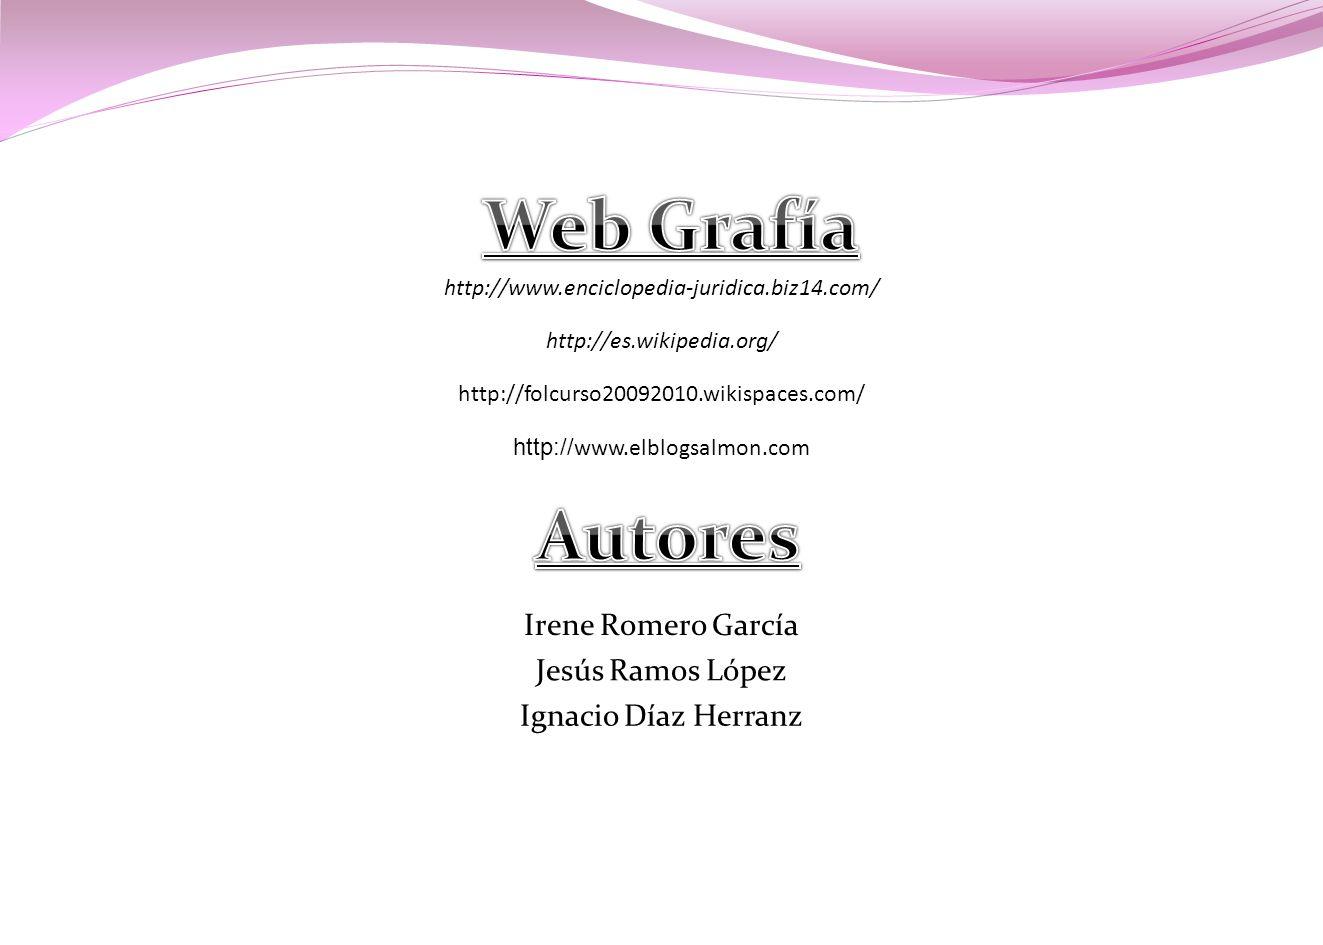 http://www.enciclopedia-juridica.biz14.com/ http://es.wikipedia.org/ http://folcurso20092010.wikispaces.com/ http:// www.elblogsalmon.com Irene Romero